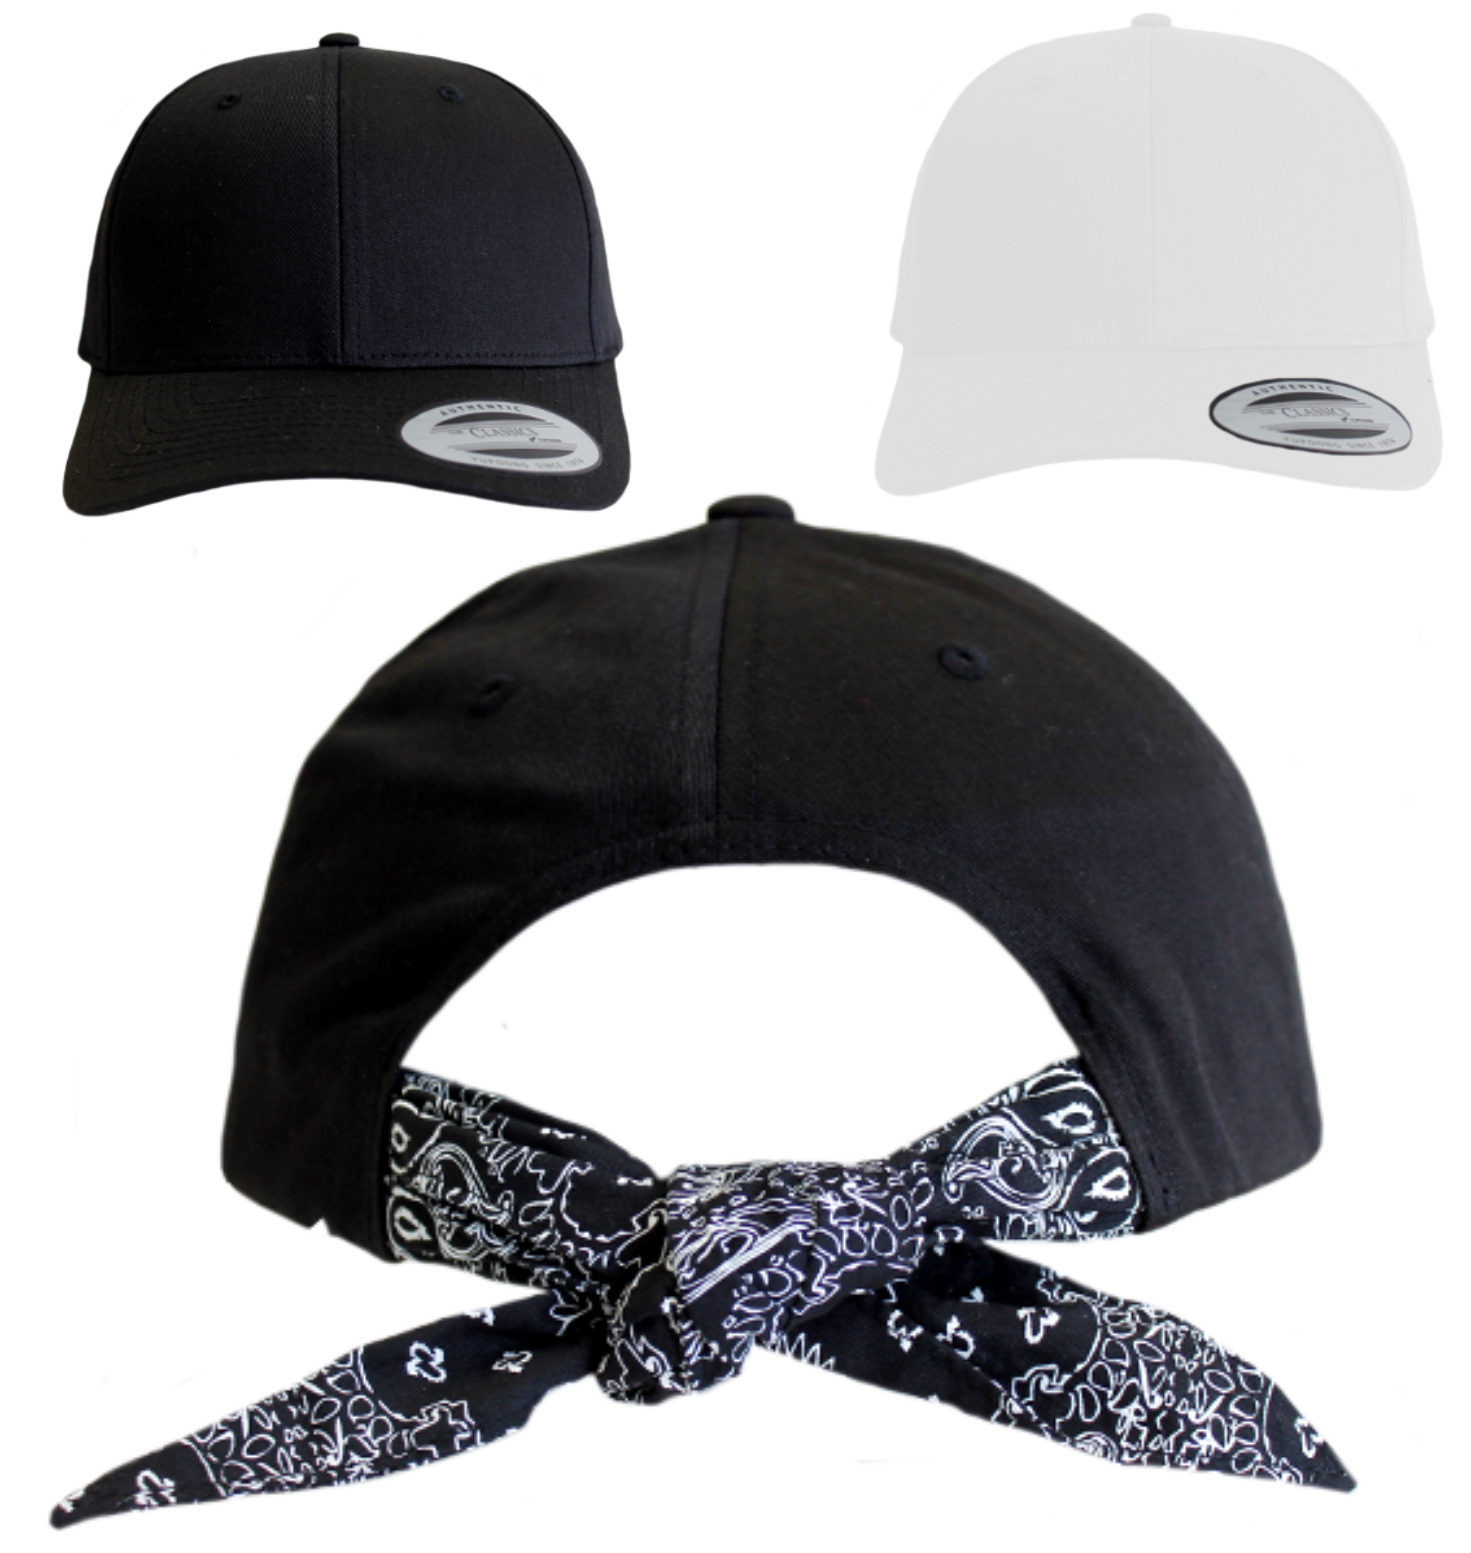 selber curved bandana tie snapback gestalten und besticken. Black Bedroom Furniture Sets. Home Design Ideas